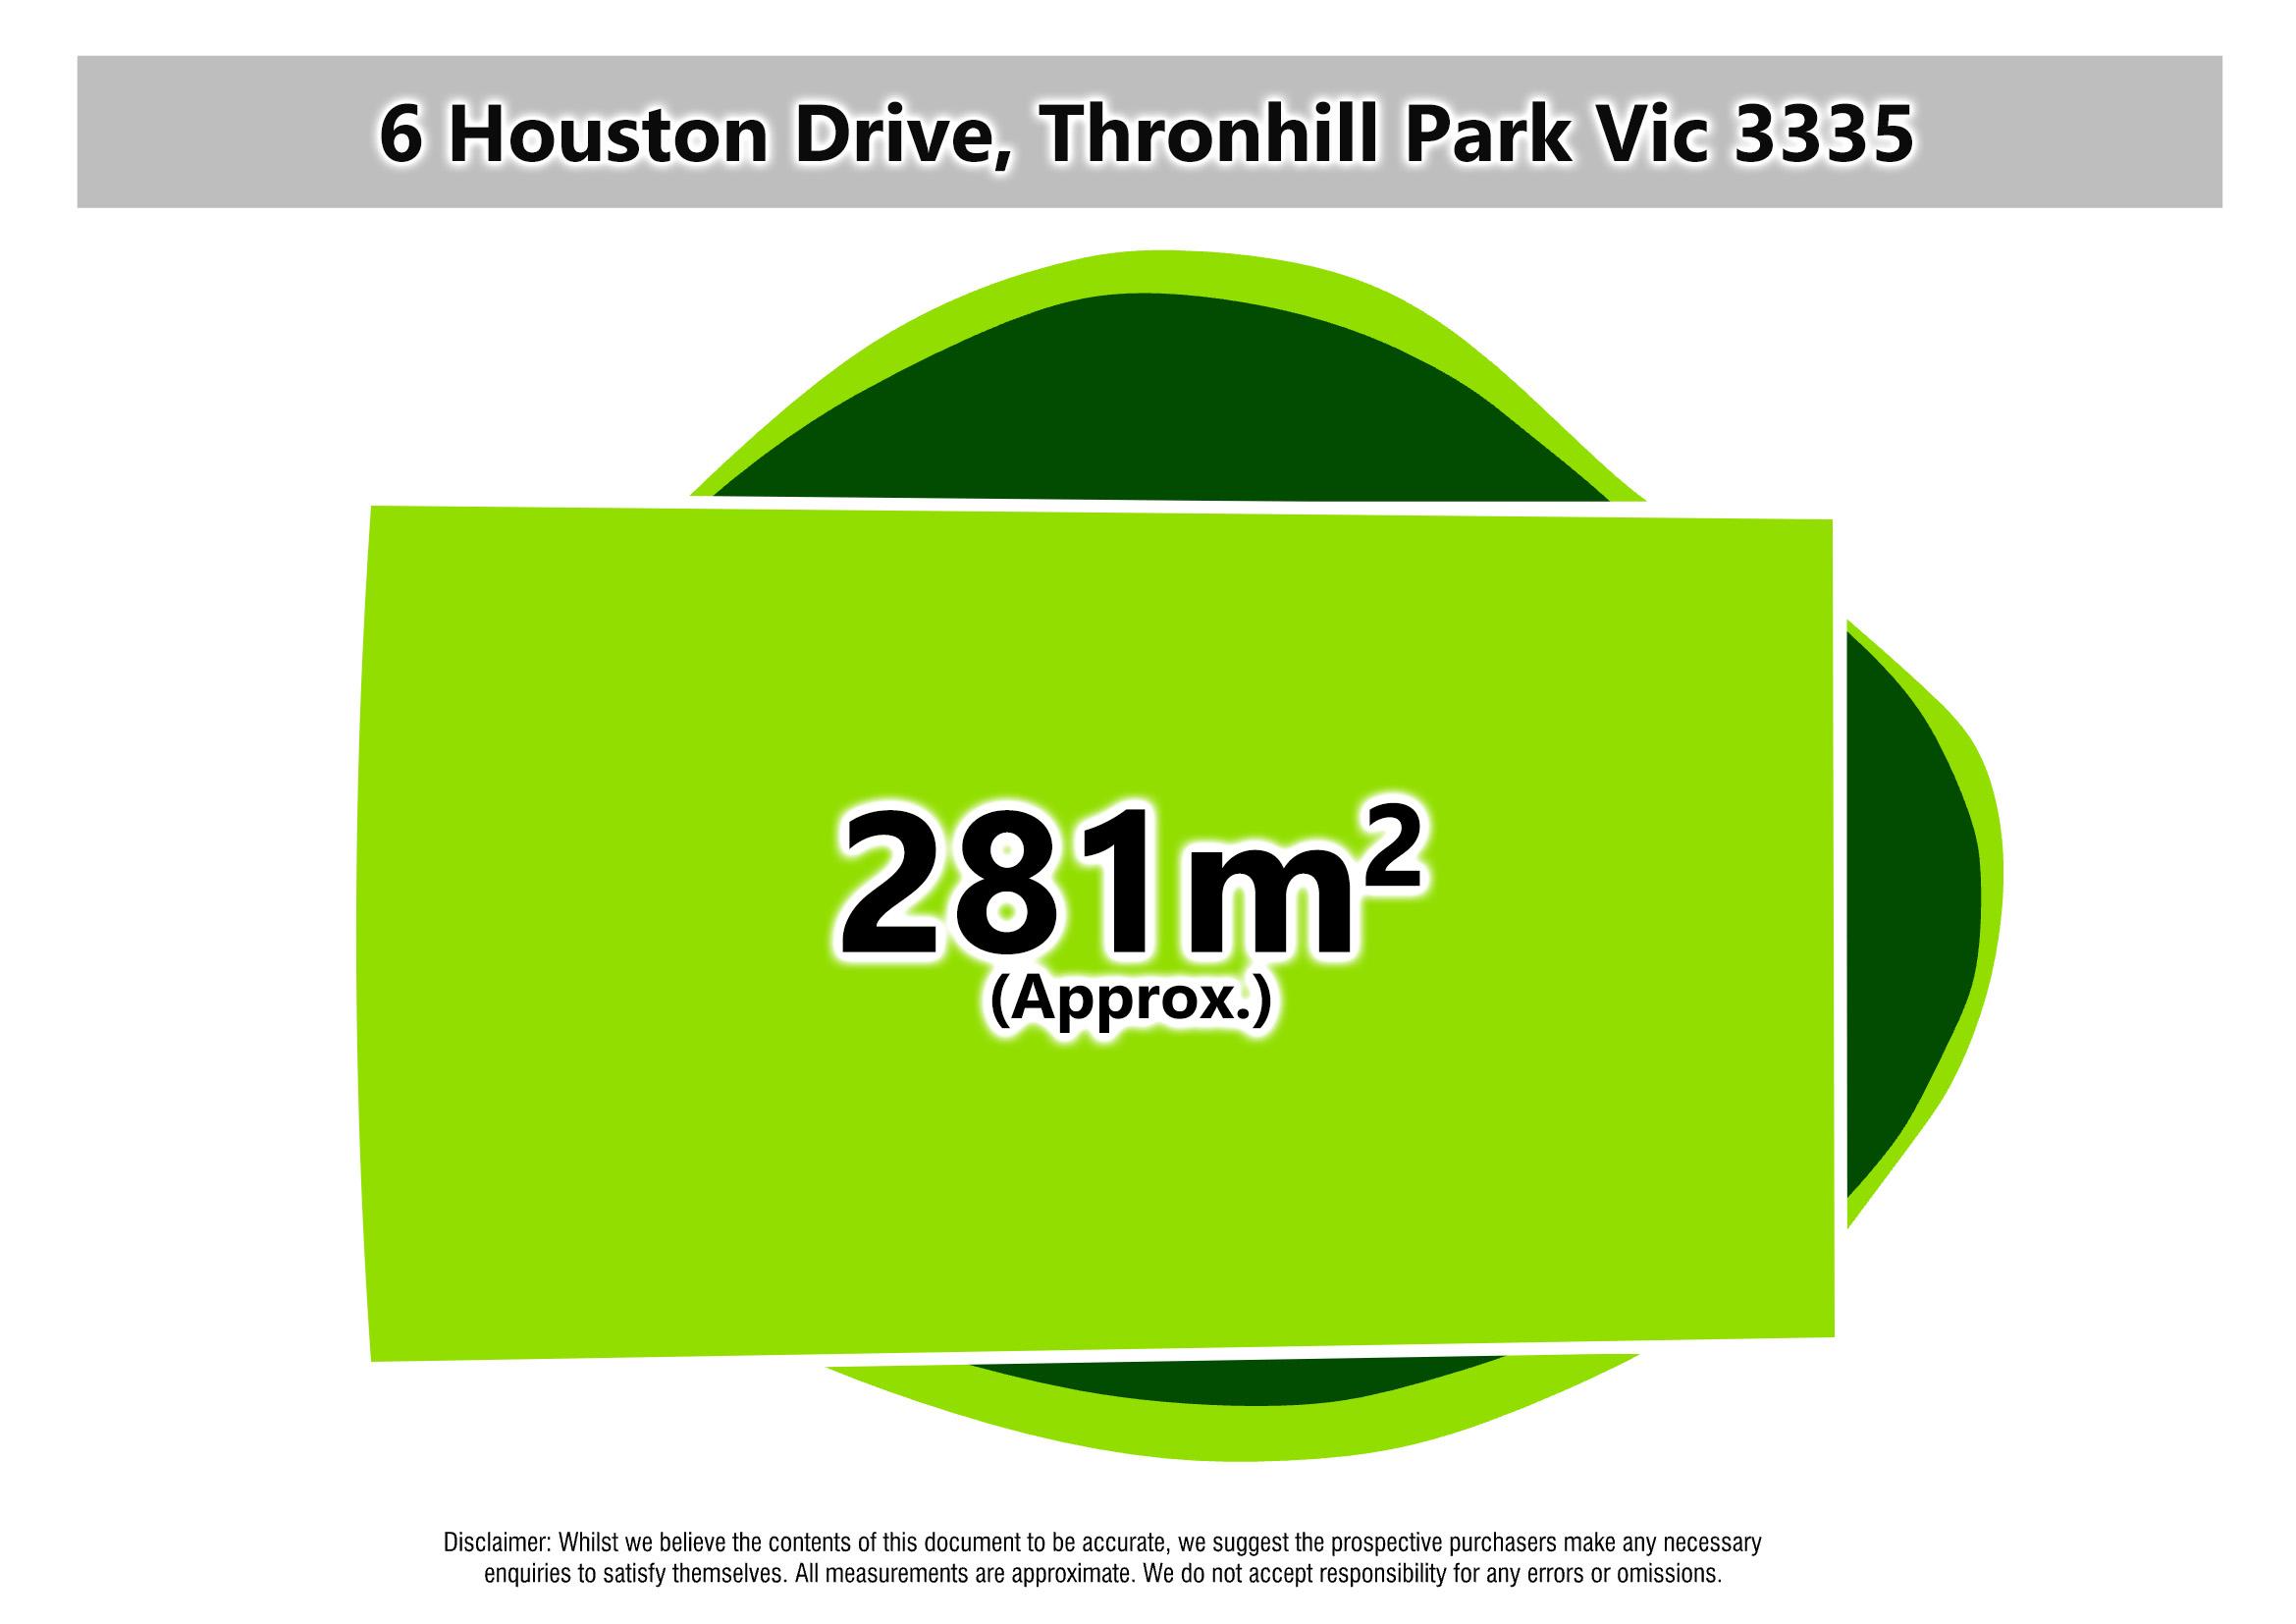 6 Houston Drive, Thornhill Park